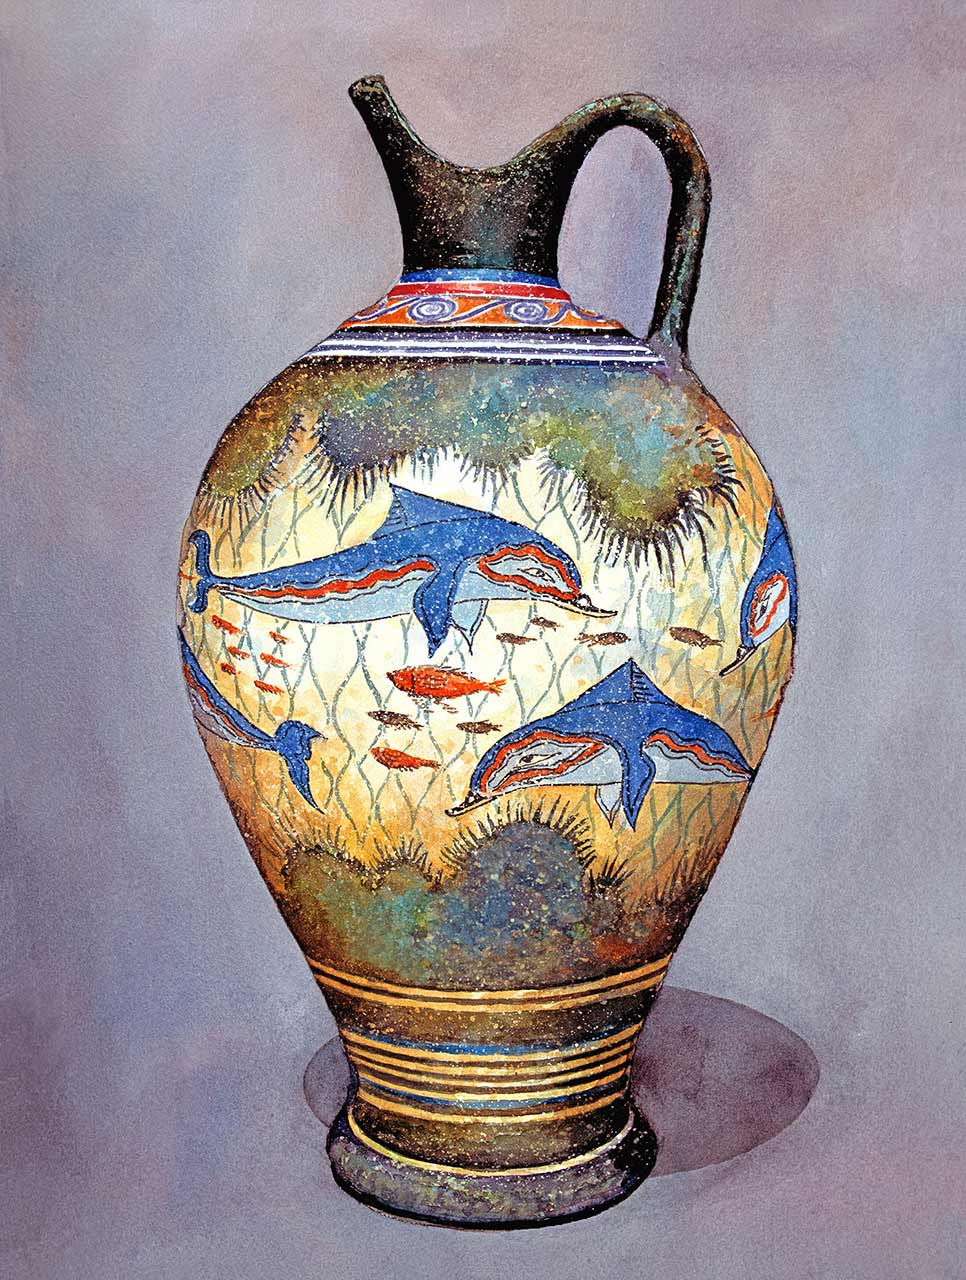 Cer mica jarrones and arte griego on pinterest - Jarrones de ceramica ...